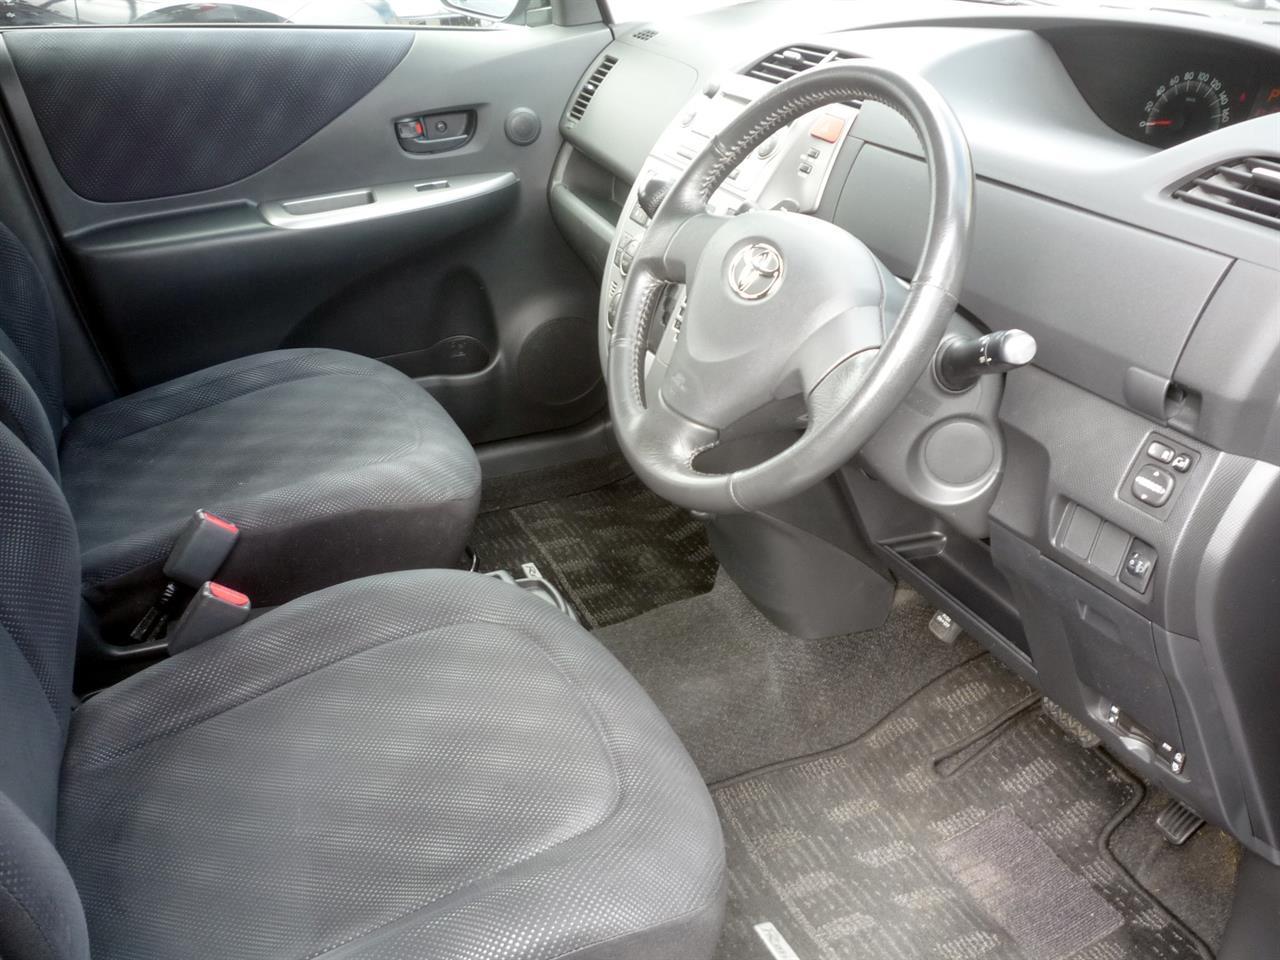 image-3, 2006 Toyota Ractis at Dunedin